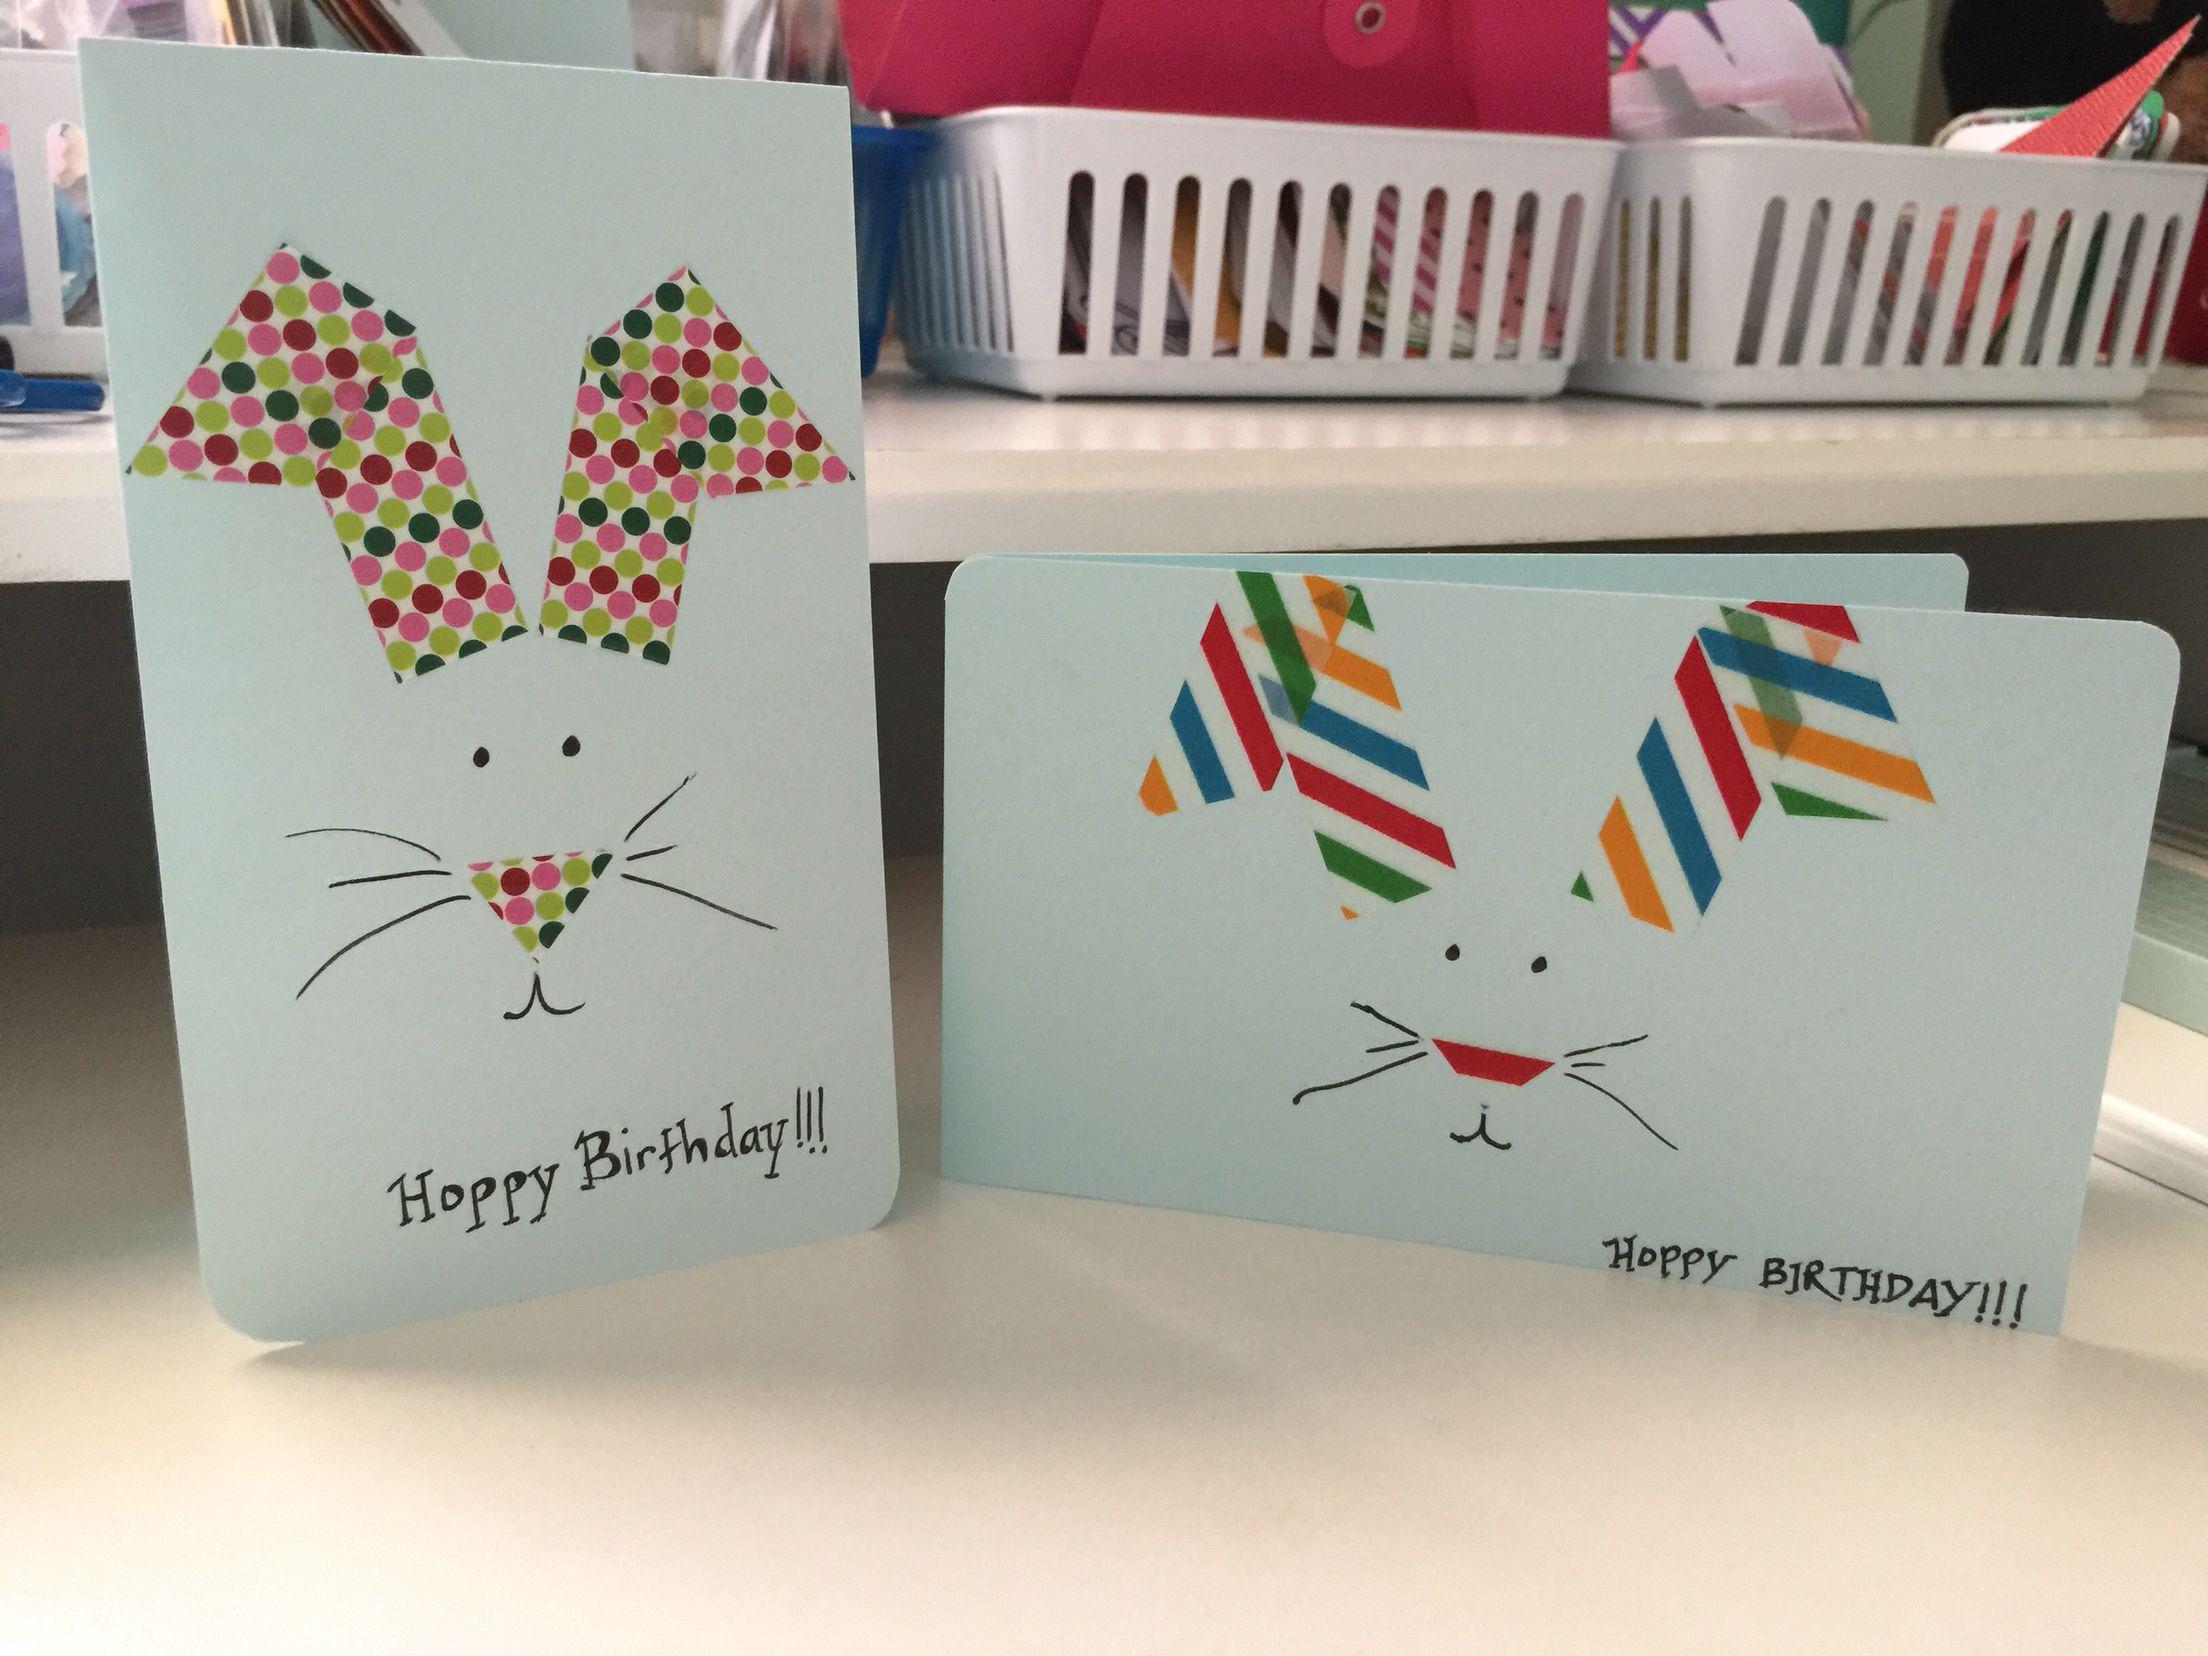 Happy Birthday Cards Diy Cards Washi Tape Scrap Diy Cards